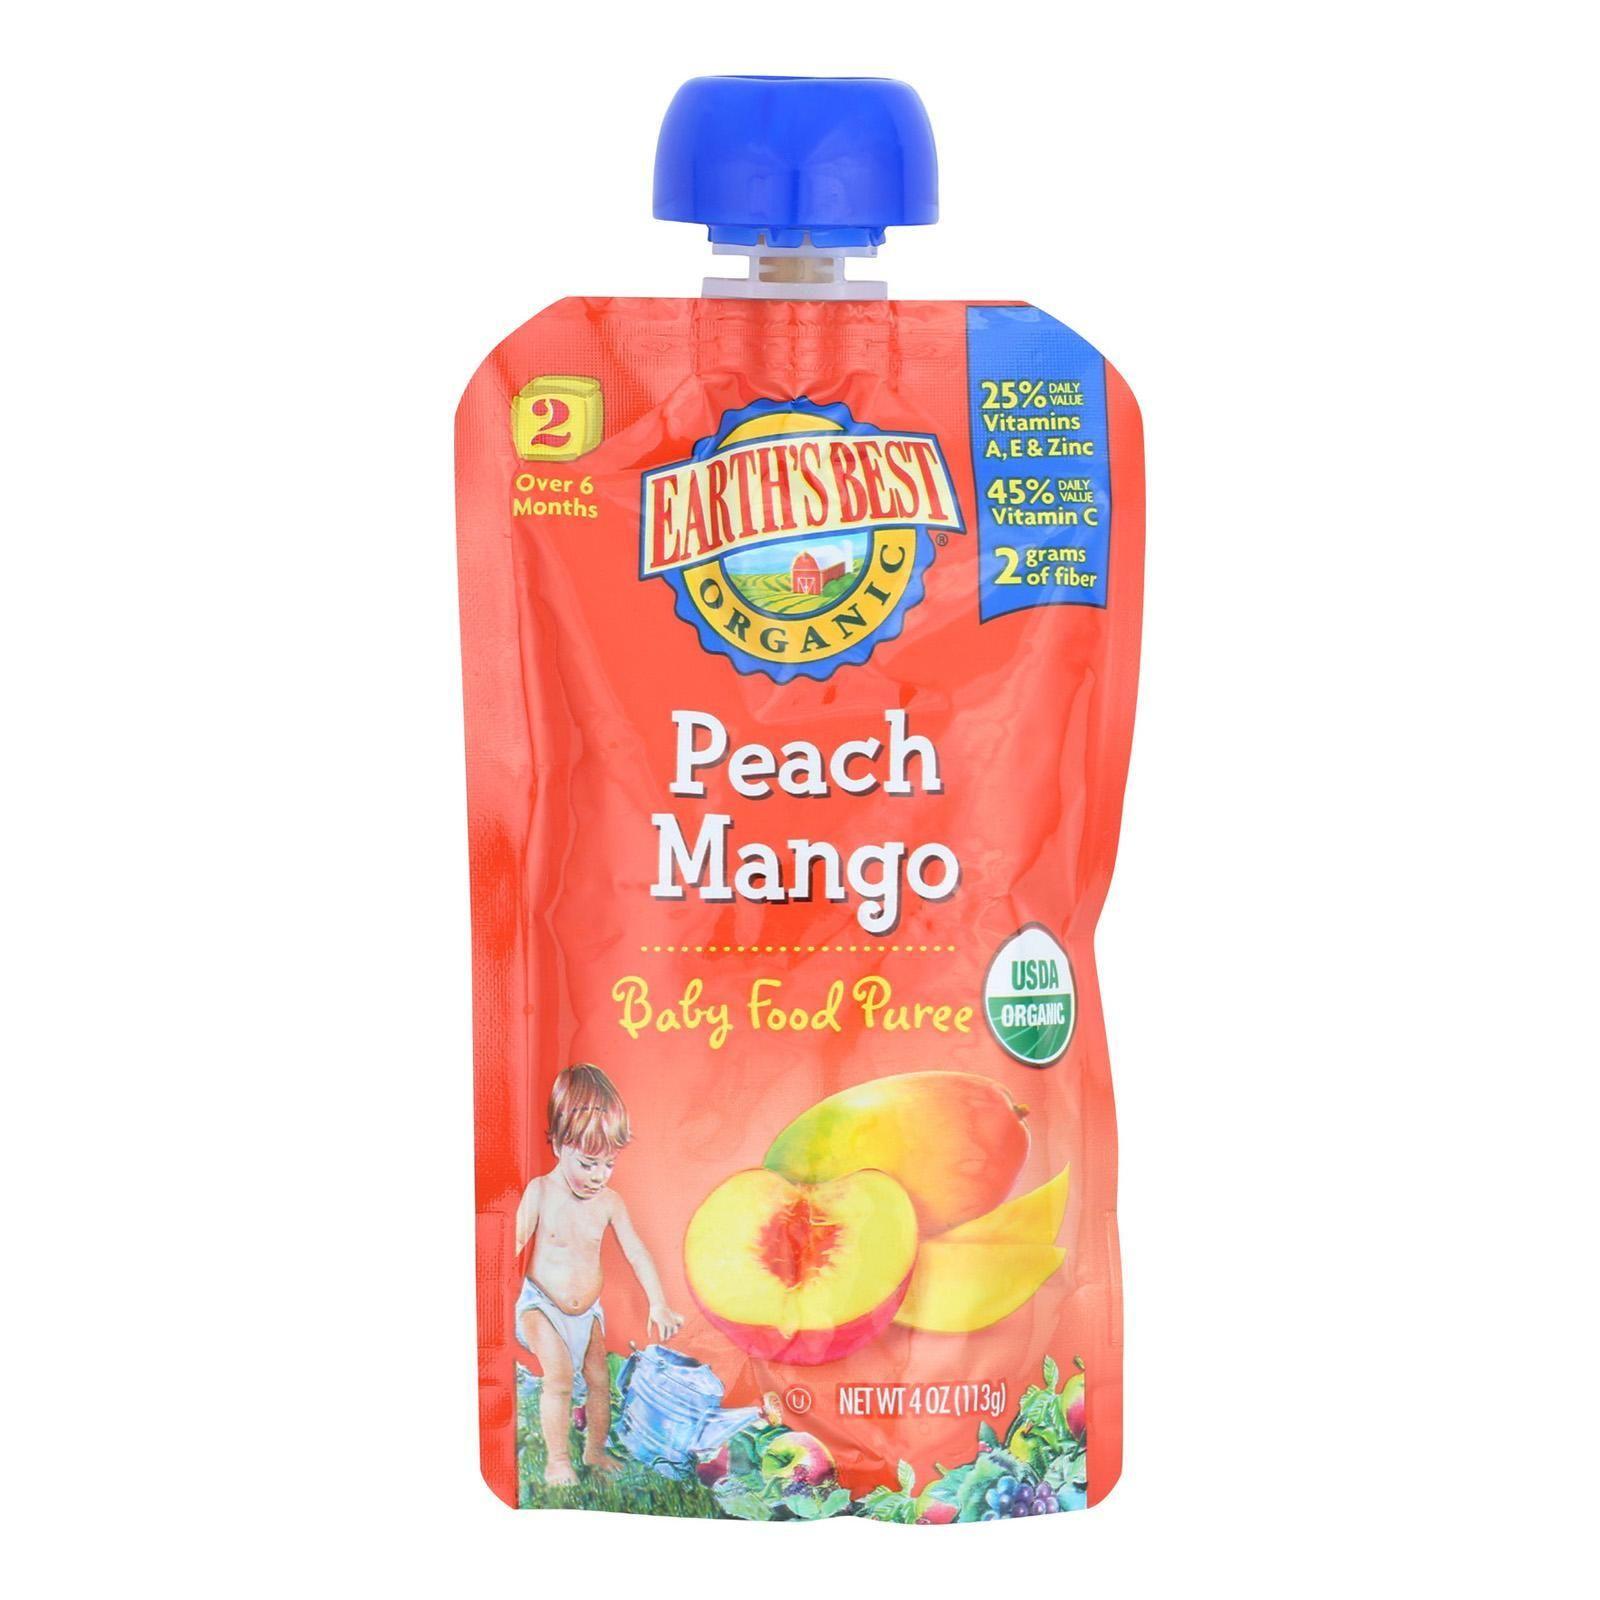 Earths best organic peach mango baby food puree stage 2